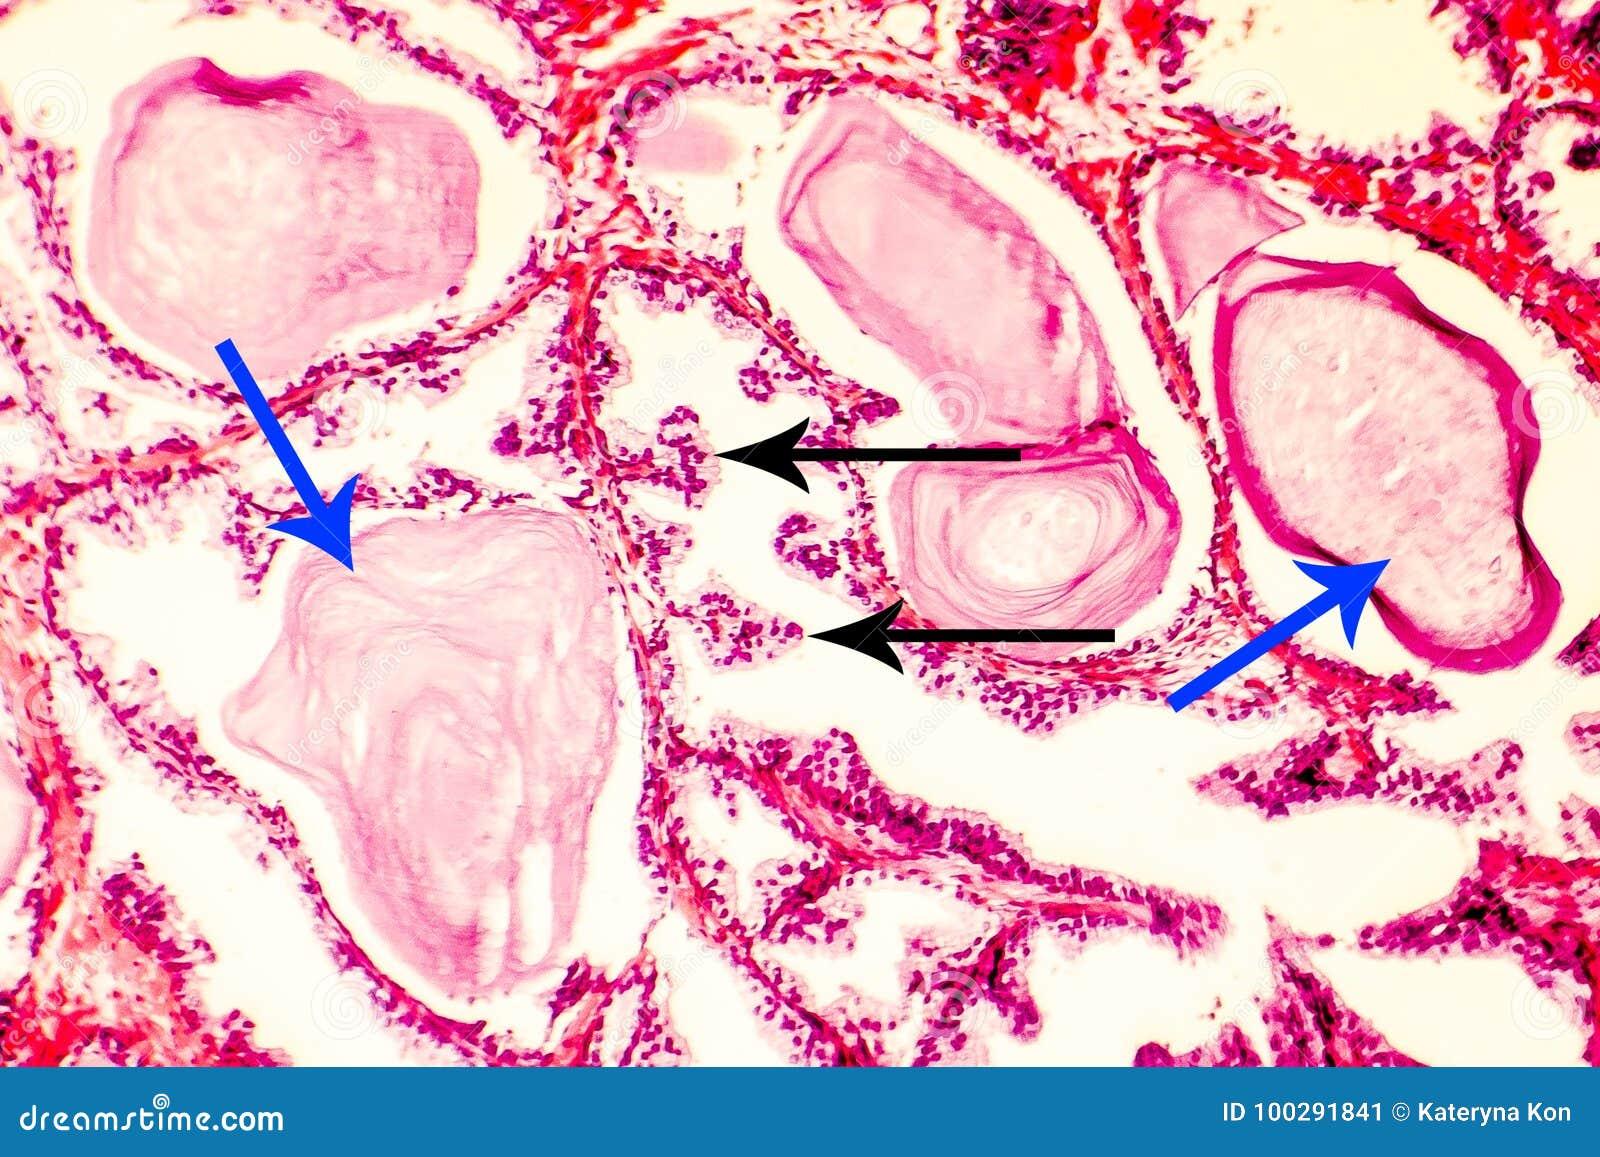 Photomicrograph of prostate hyperplasia